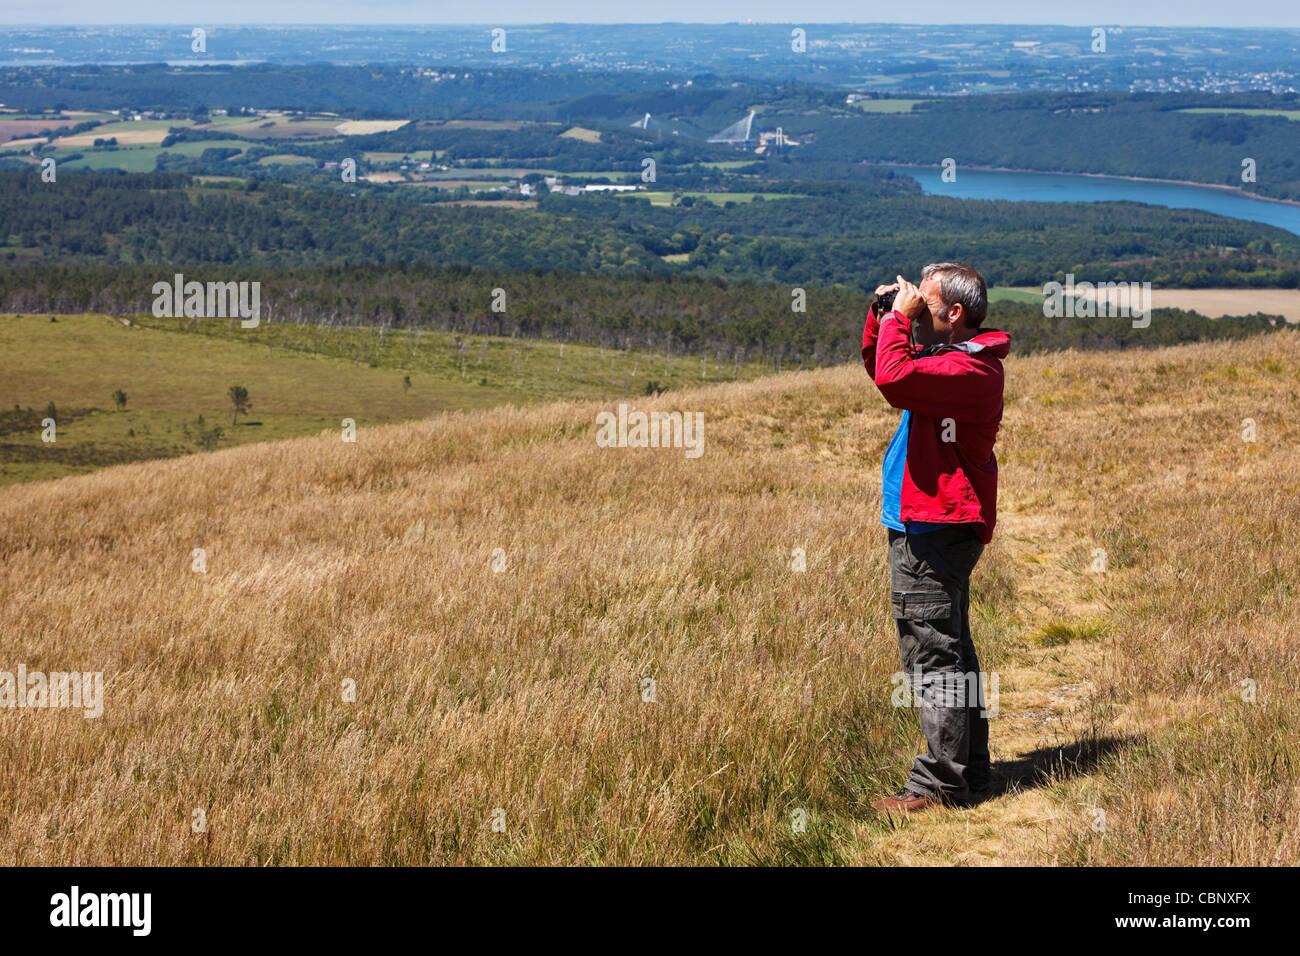 Man with binoculars birdwatching in early summer - Stock Image